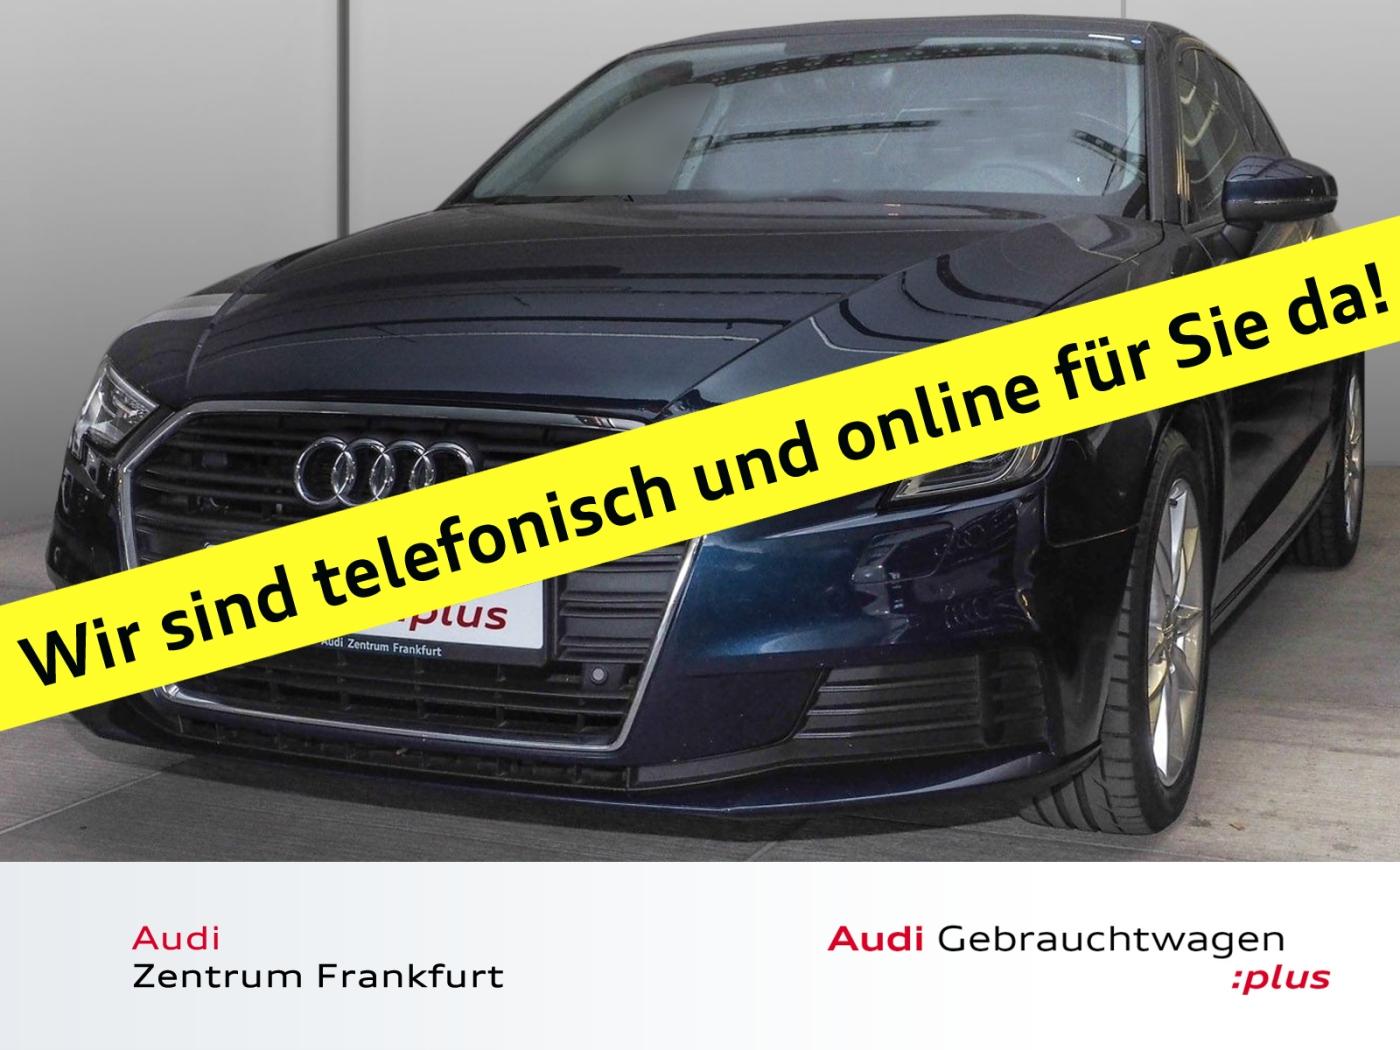 Audi A3 Sportback 1.0 TFSI Navi Xenon PDC Sitzheizung, Jahr 2018, Benzin